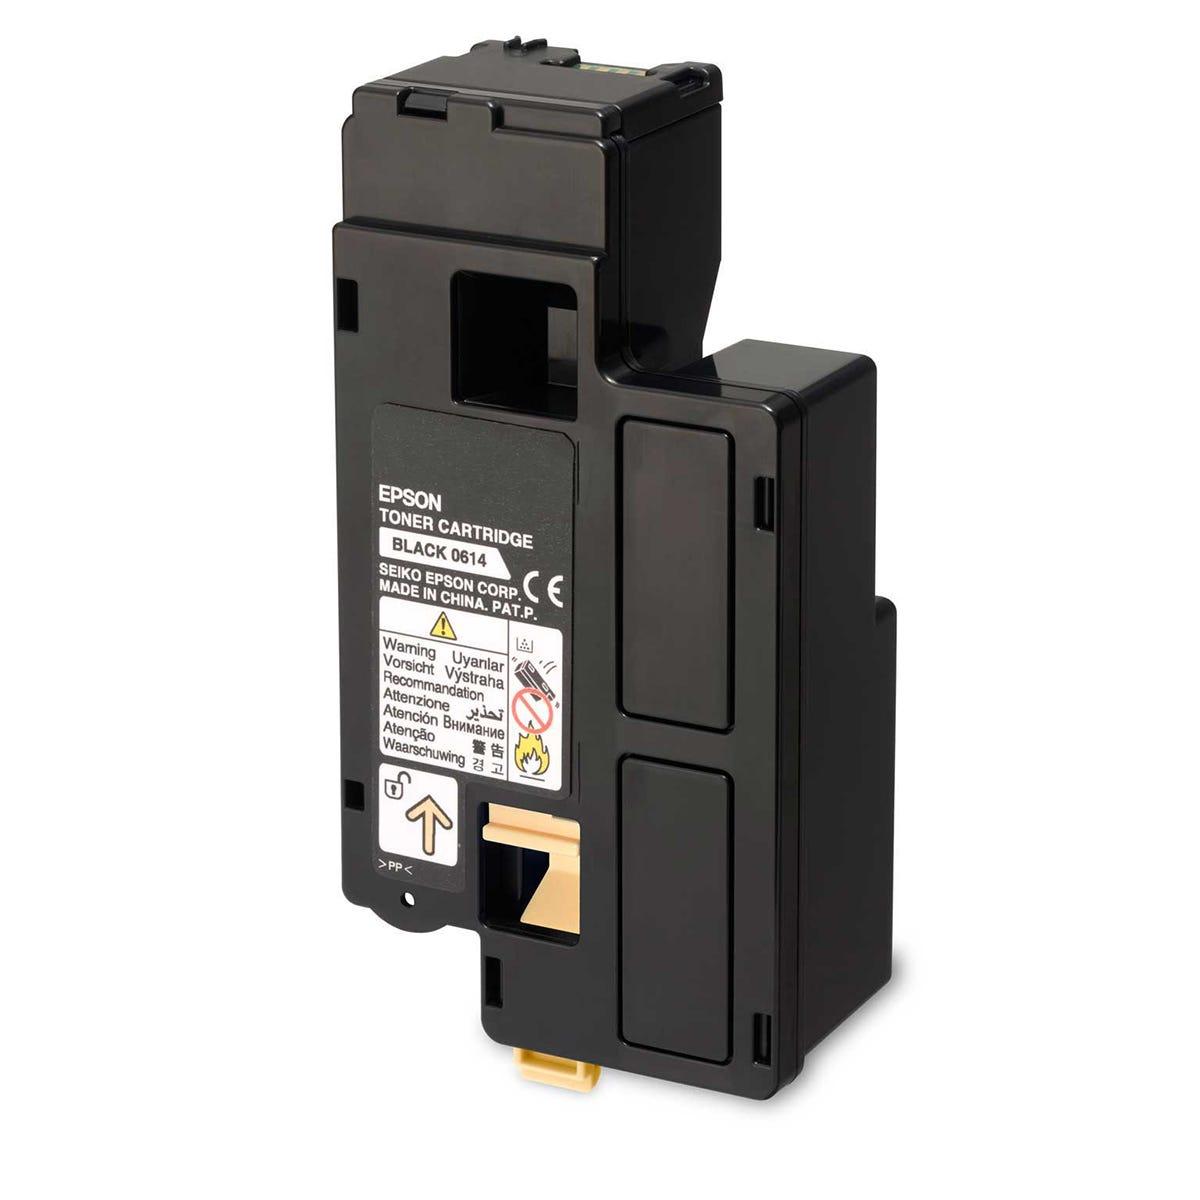 Epson Aculaser C1700 Toner High Yield, Black.